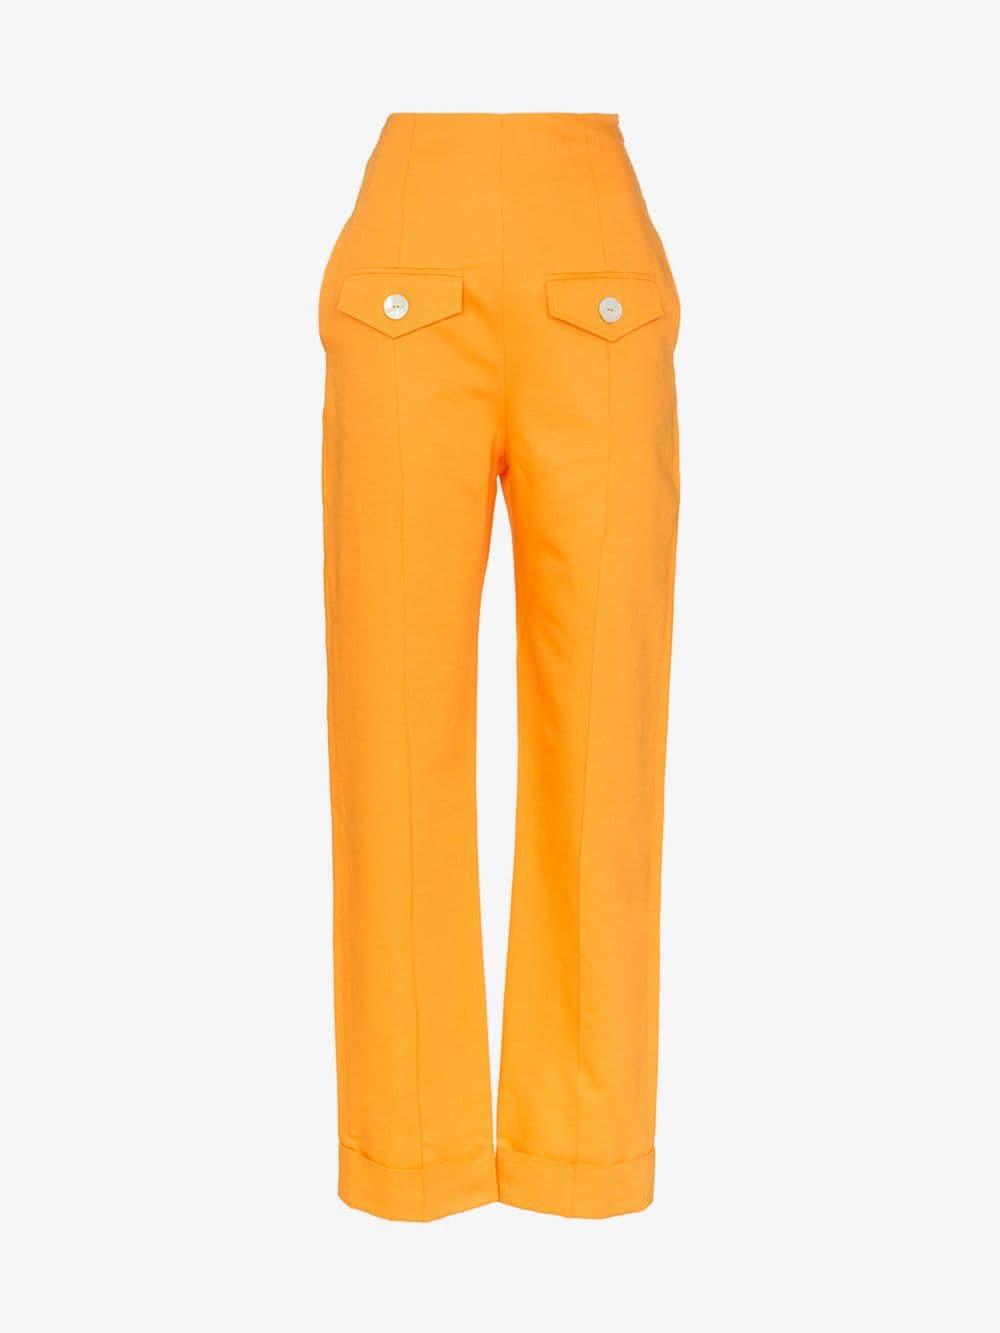 George Keburia high-waisted pocket detail straight leg trousers in orange